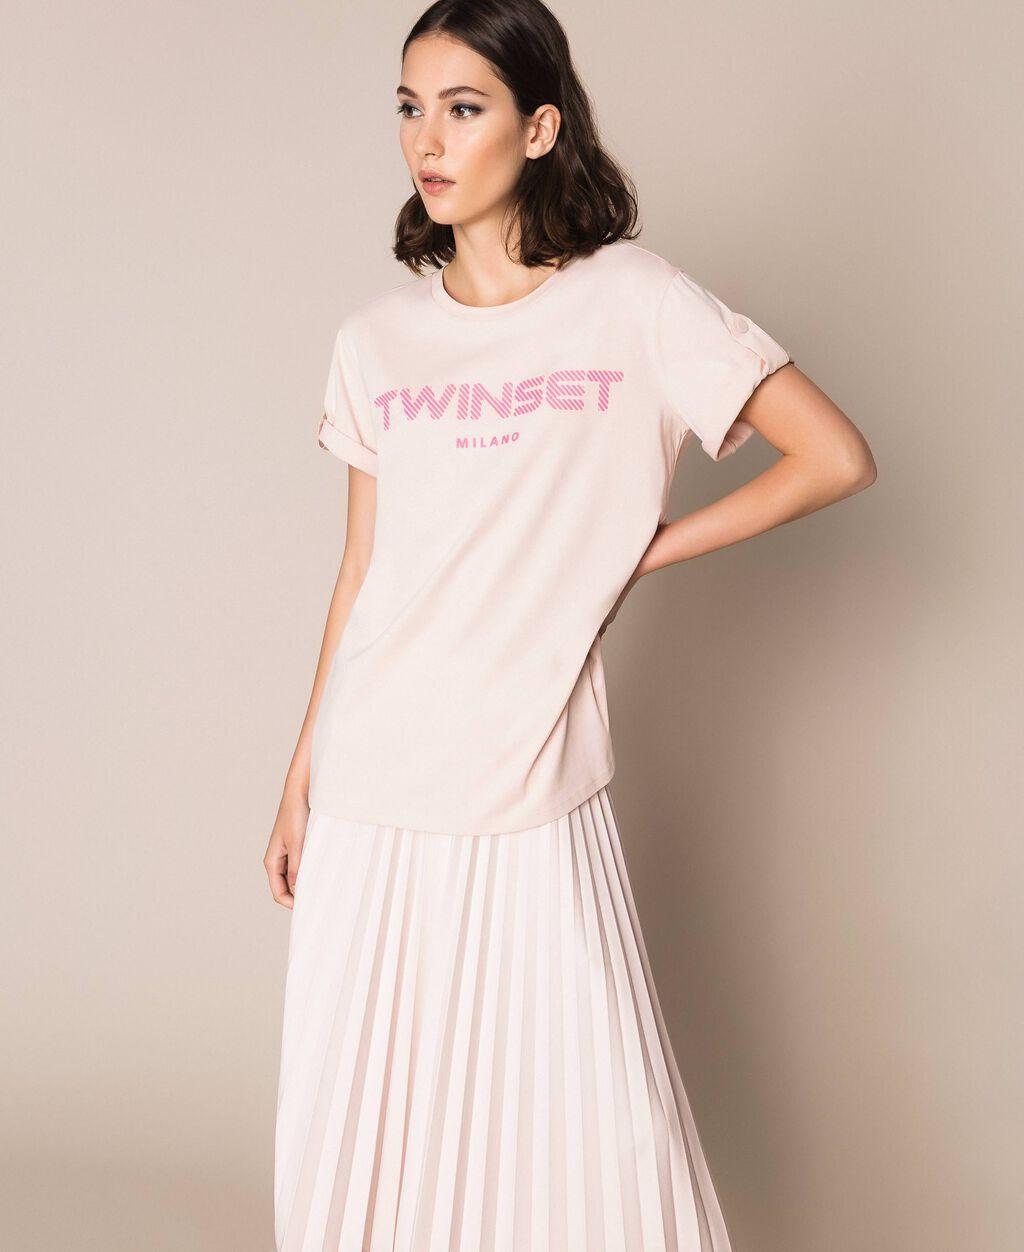 T-shirt con logo in rilievo